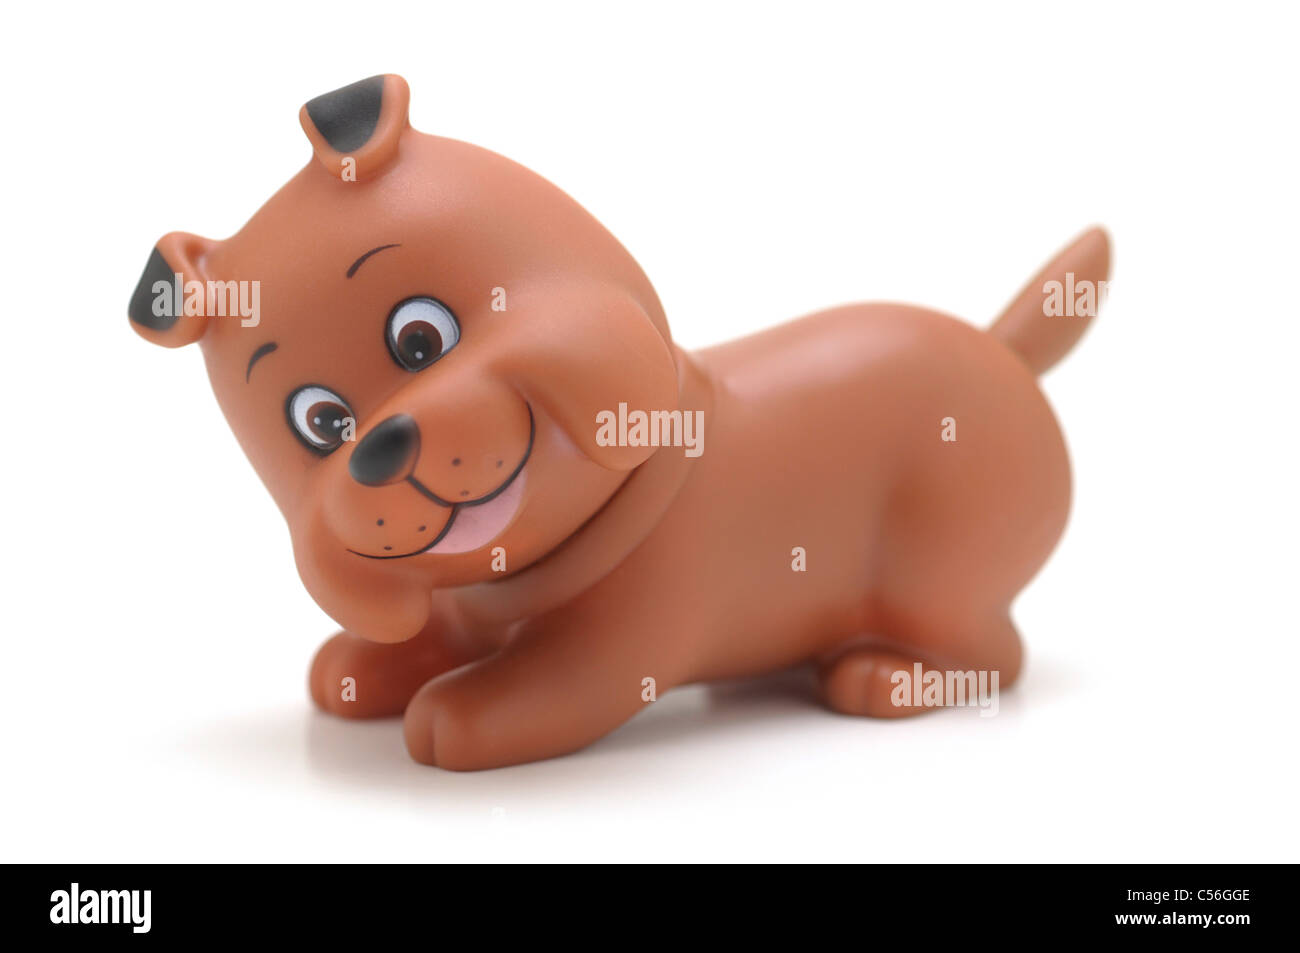 Spielzeug Hund Welpe, Pet Stockbild